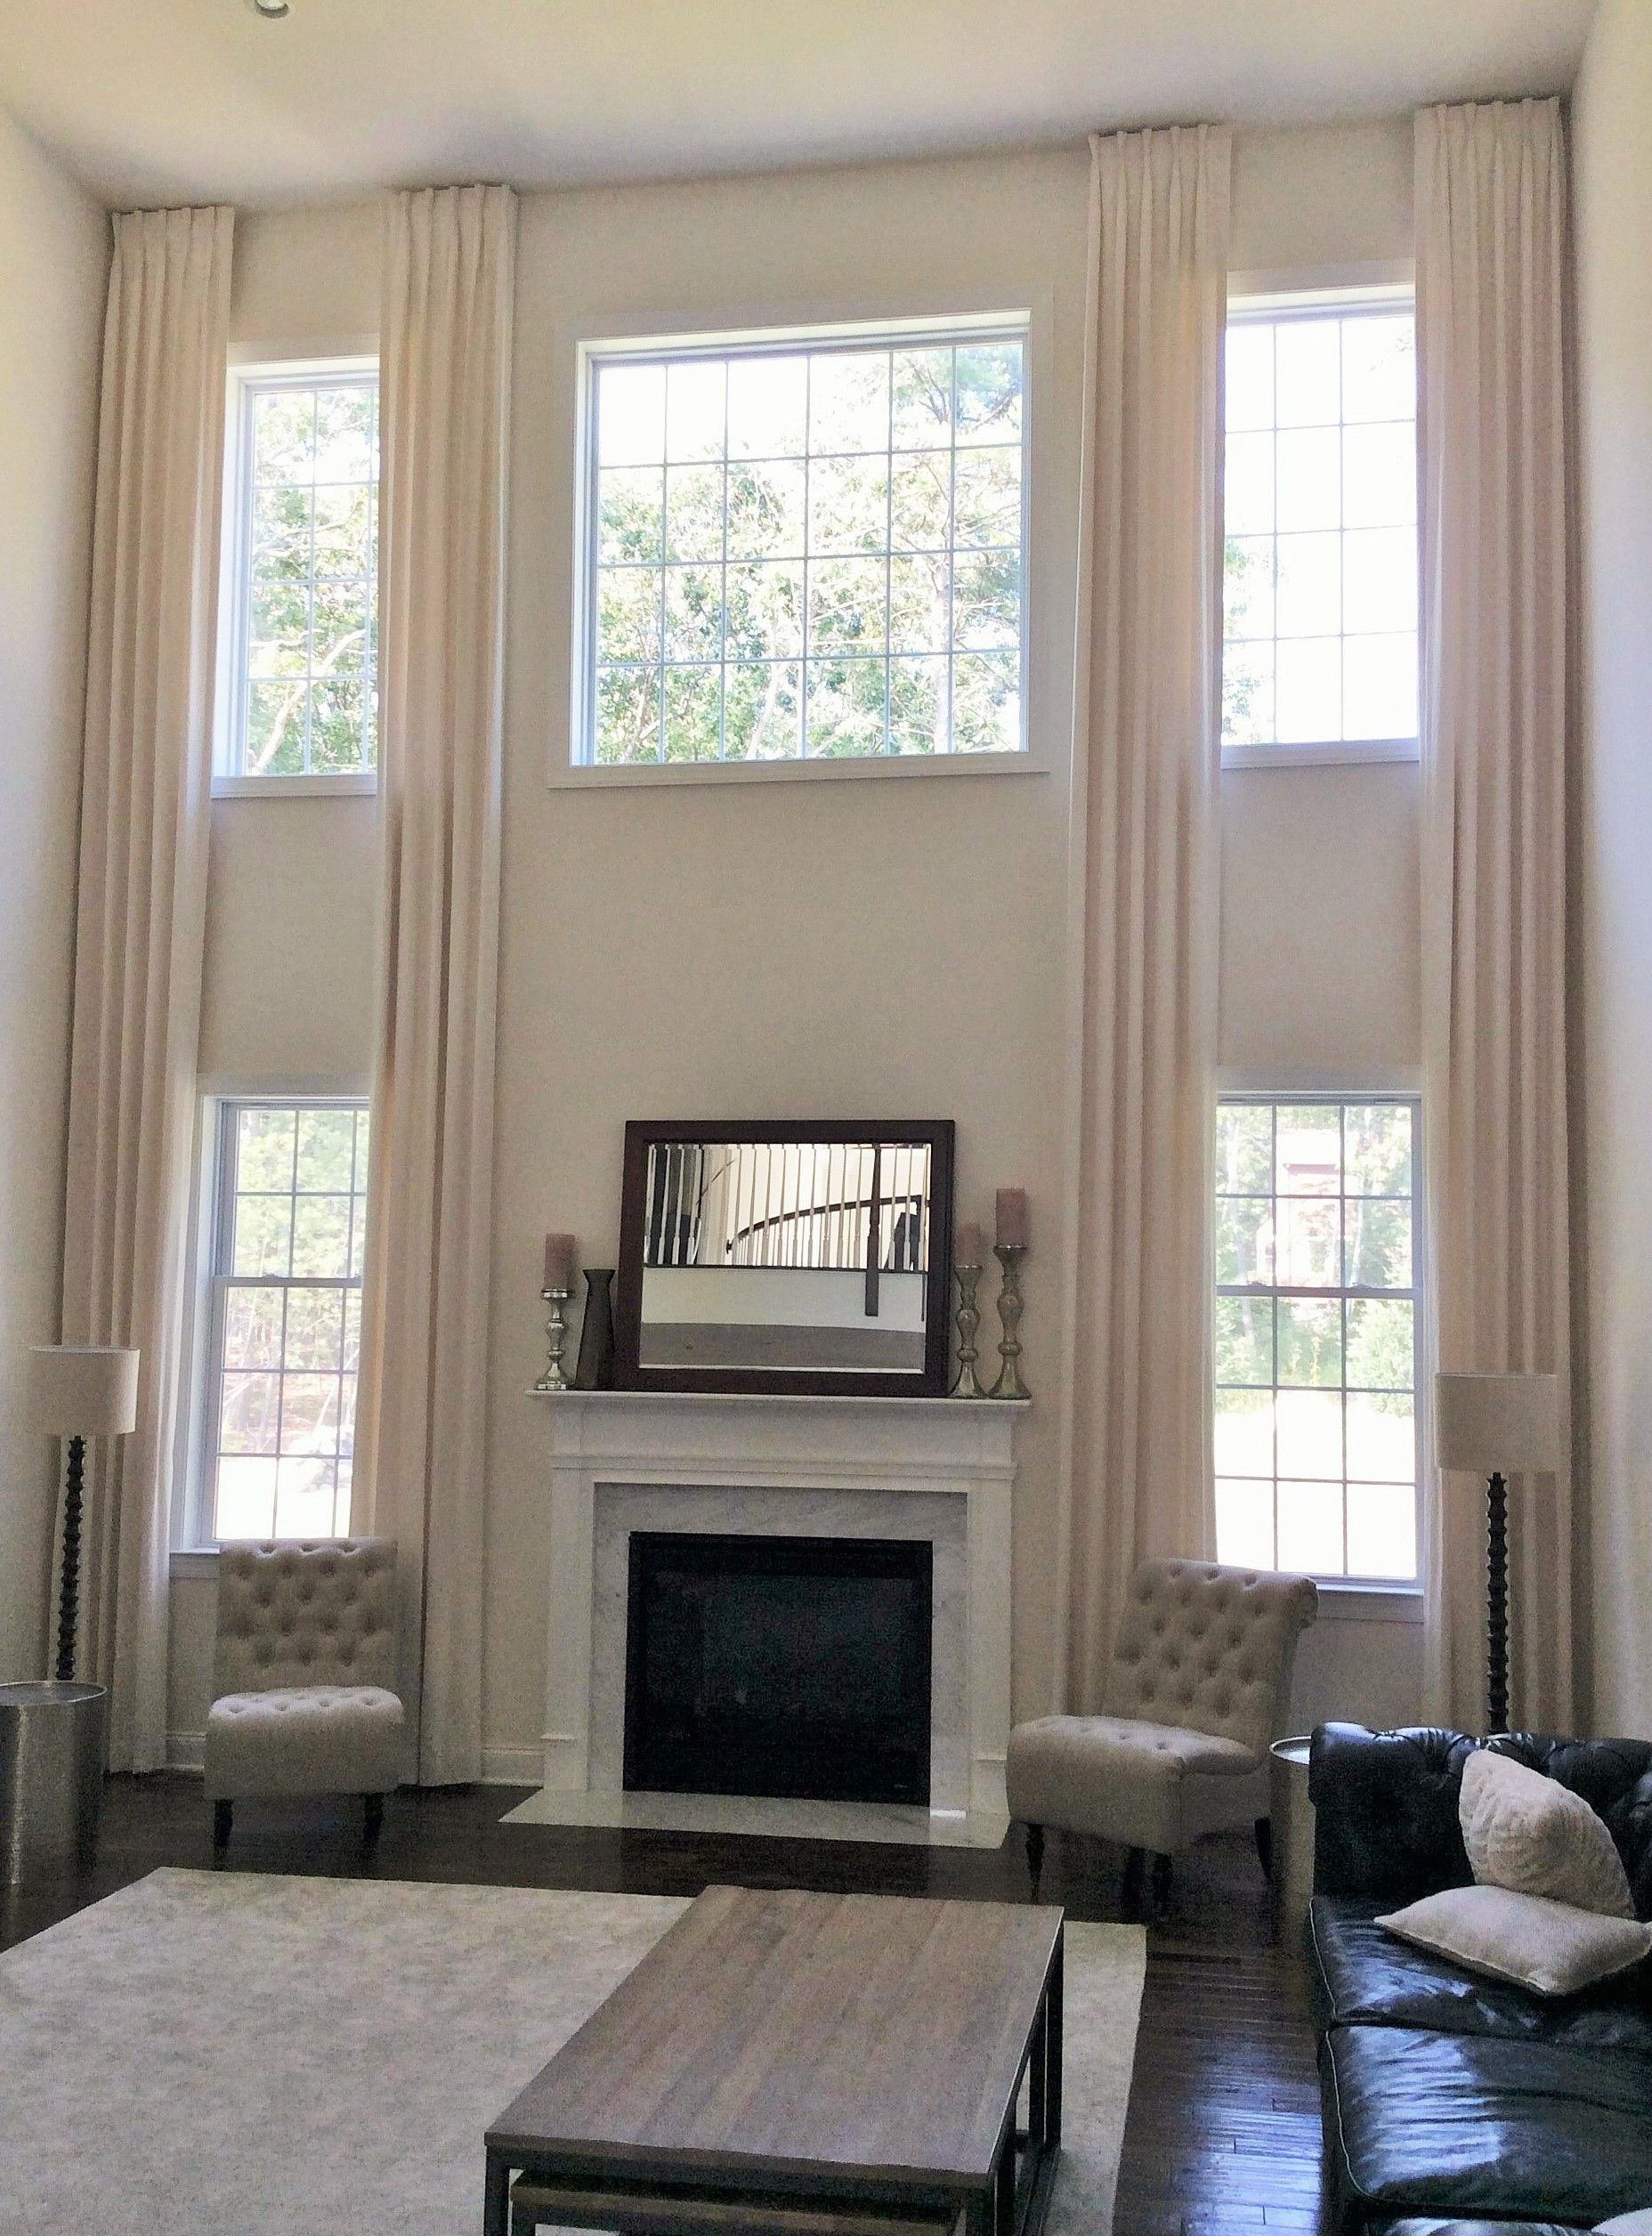 Two Story Drapery Window Treatments Living Room Tall Windows Living Room High Ceiling Living Room #pictures #of #living #room #window #treatments